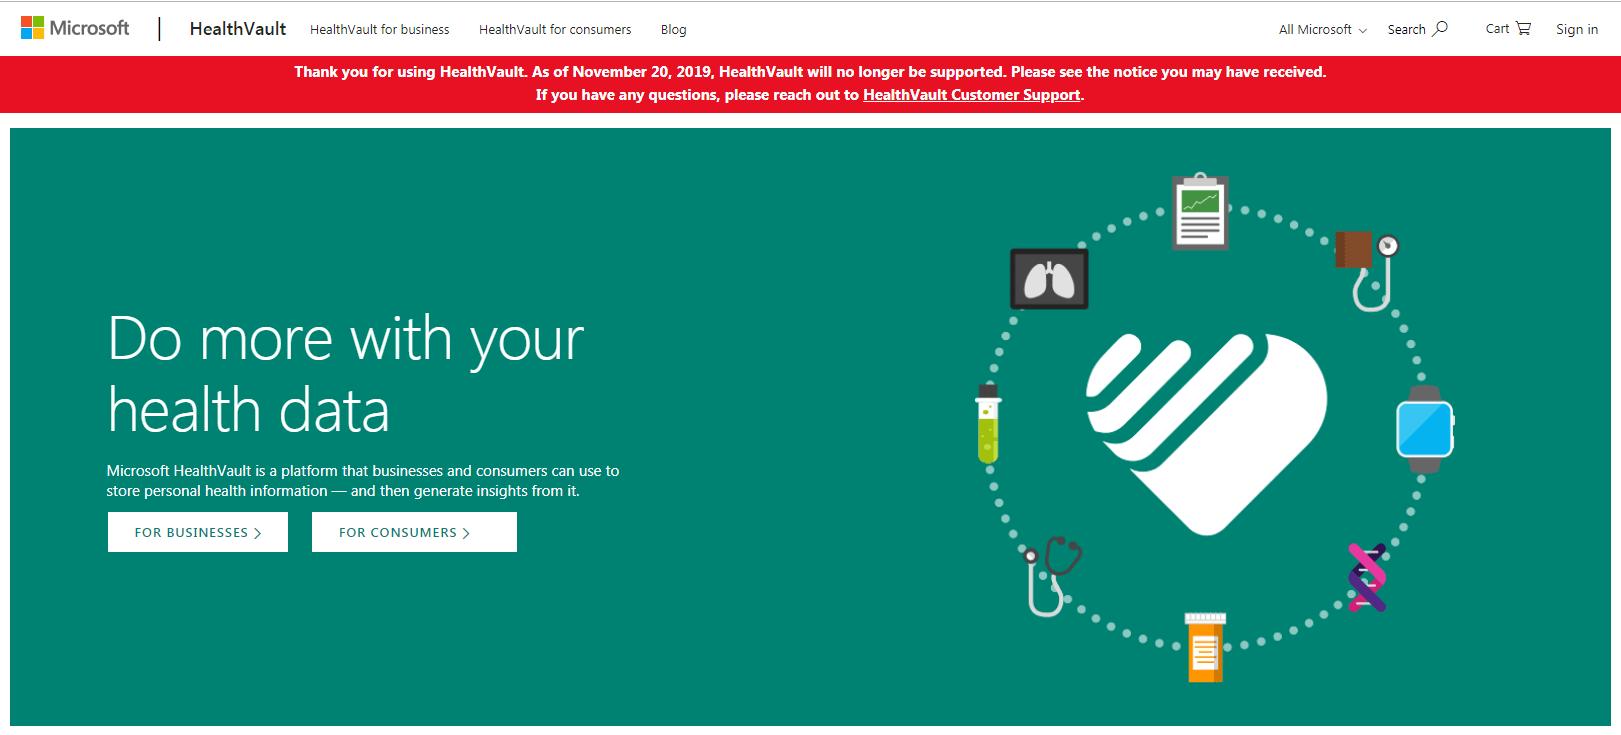 Microsoft HealthVault shutting down in November